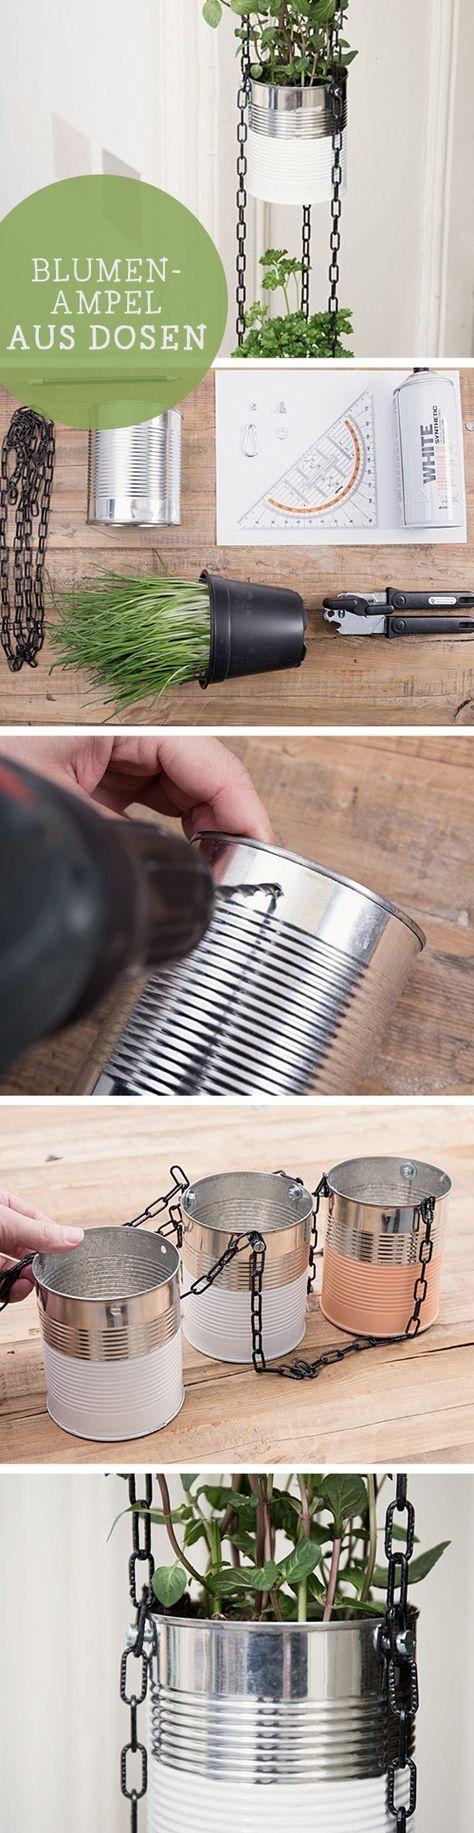 DIY-Anleitung: Hängende Blumenampel aus Dosen / upcycling diy tutorial: craft hanging planters with cans, kitchen decor via DaWanda.com